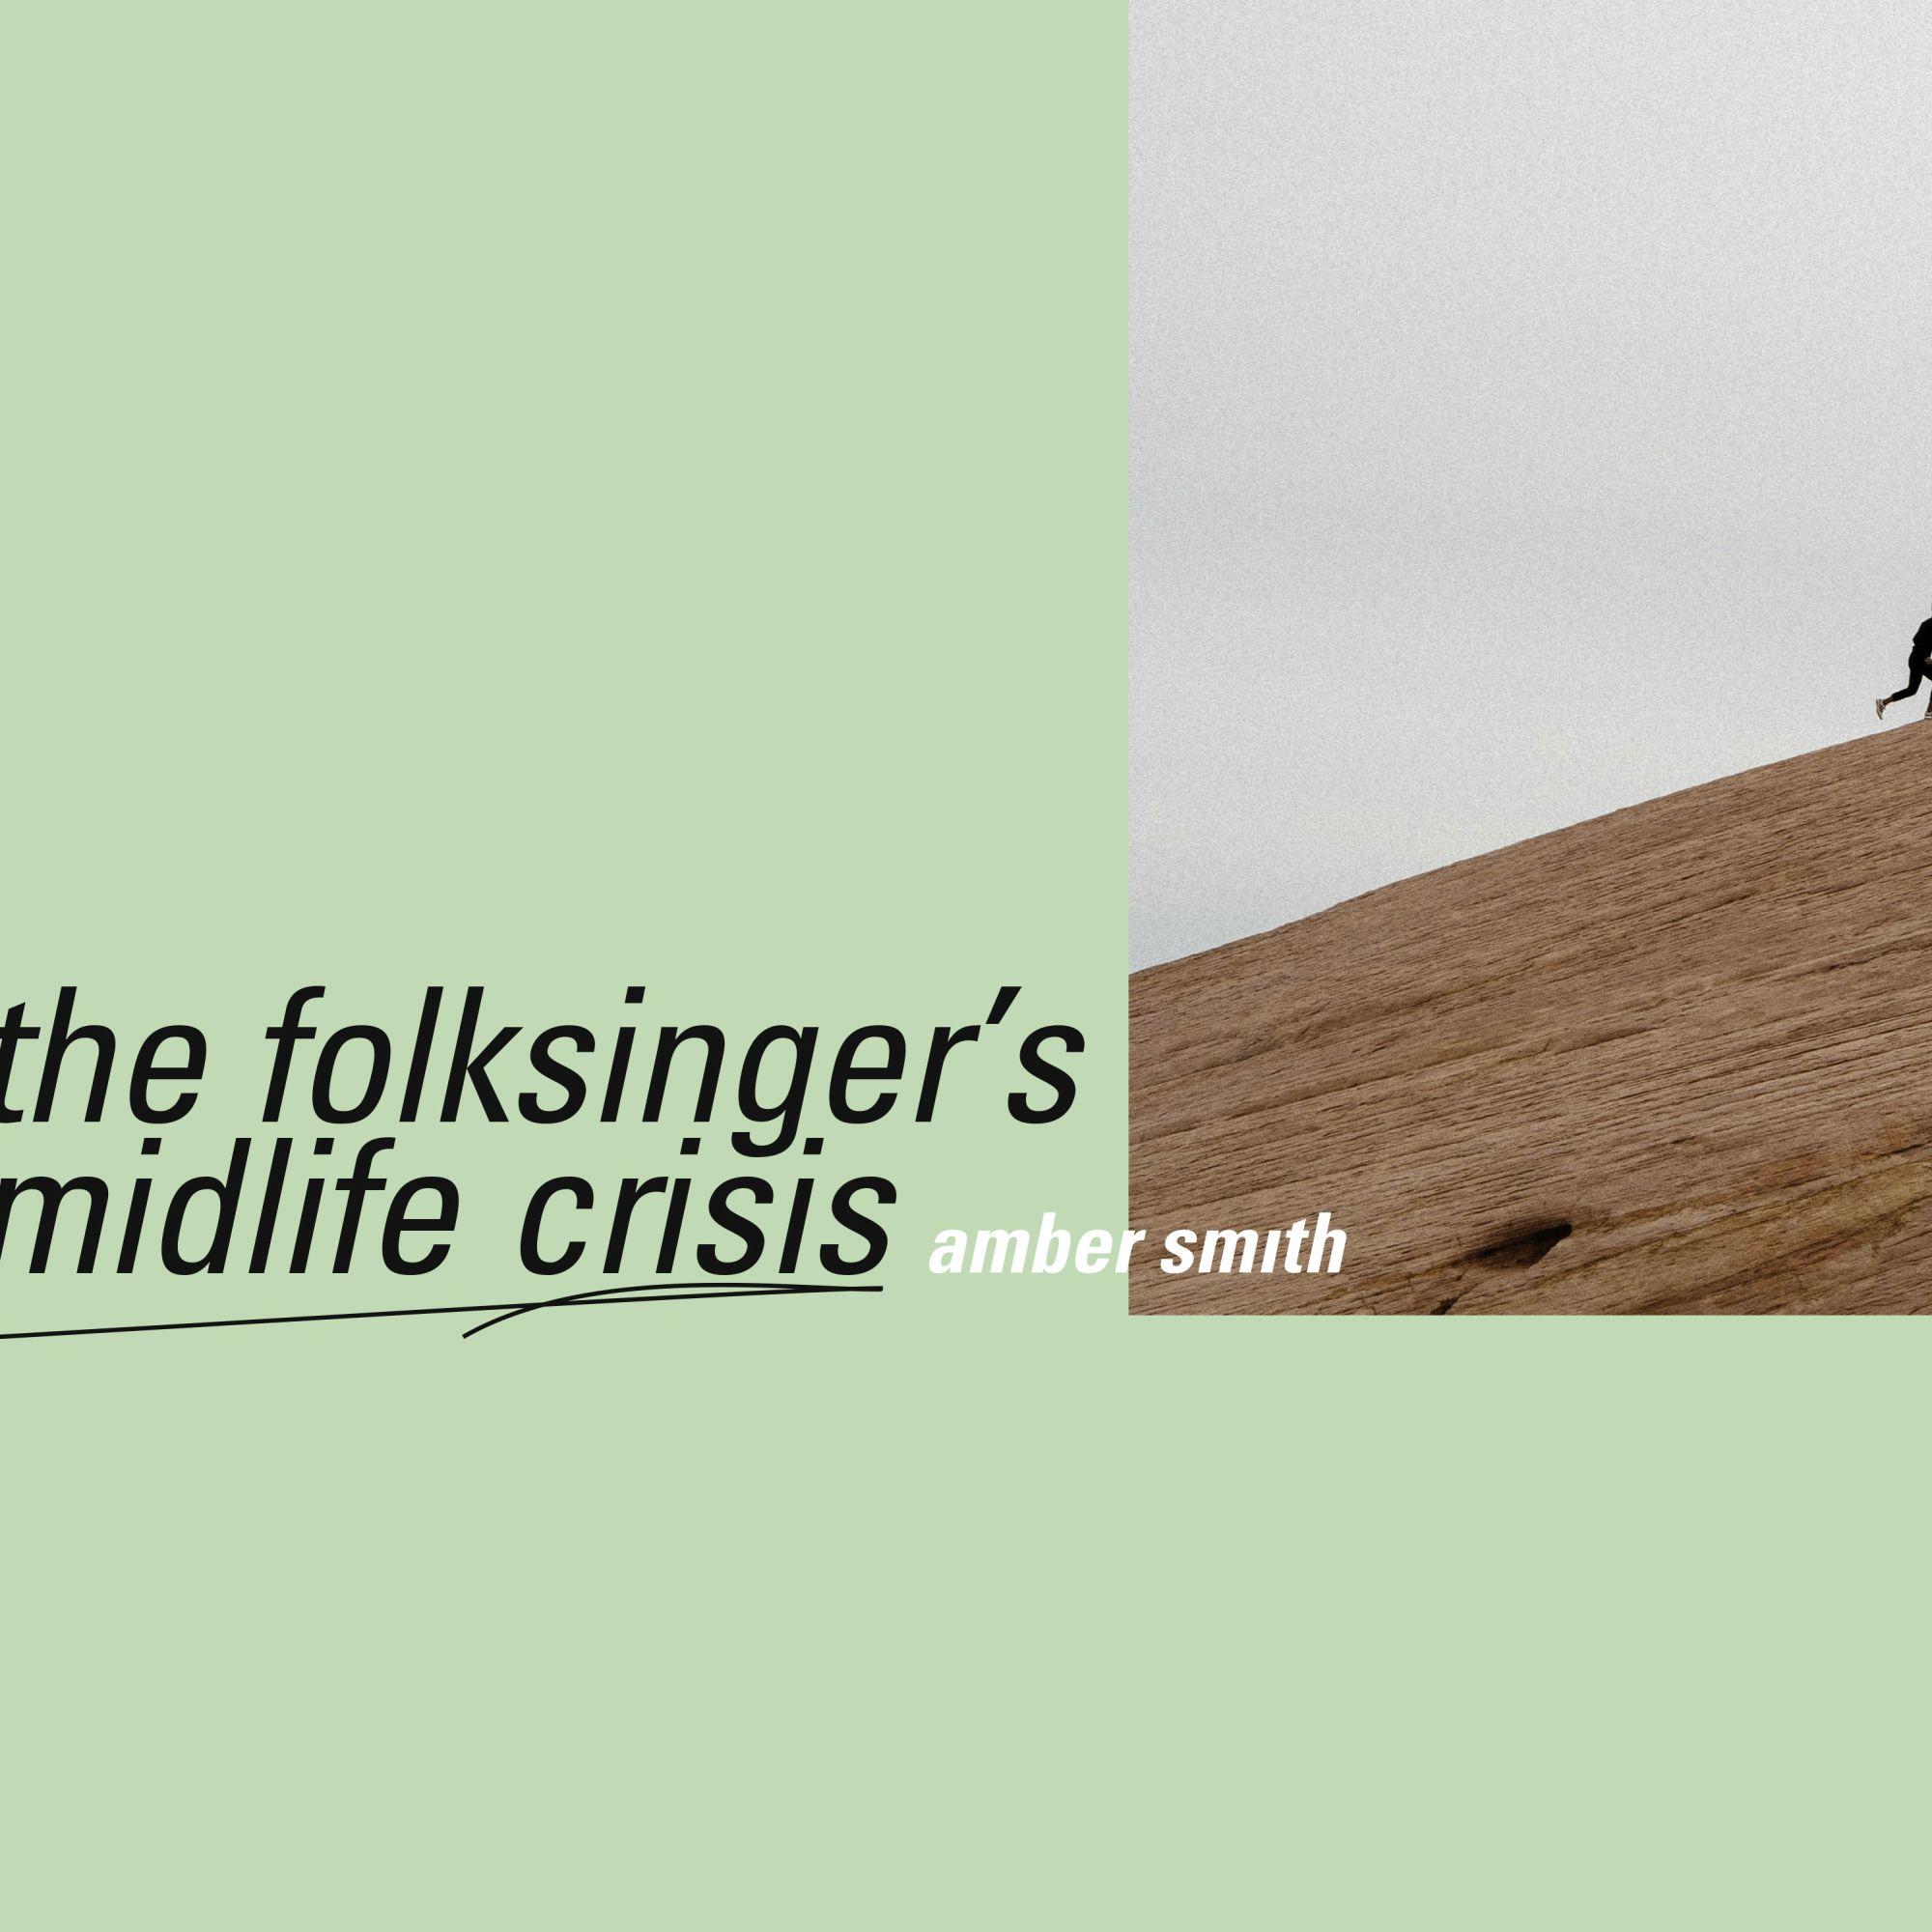 as_folk_s_3000.jpg